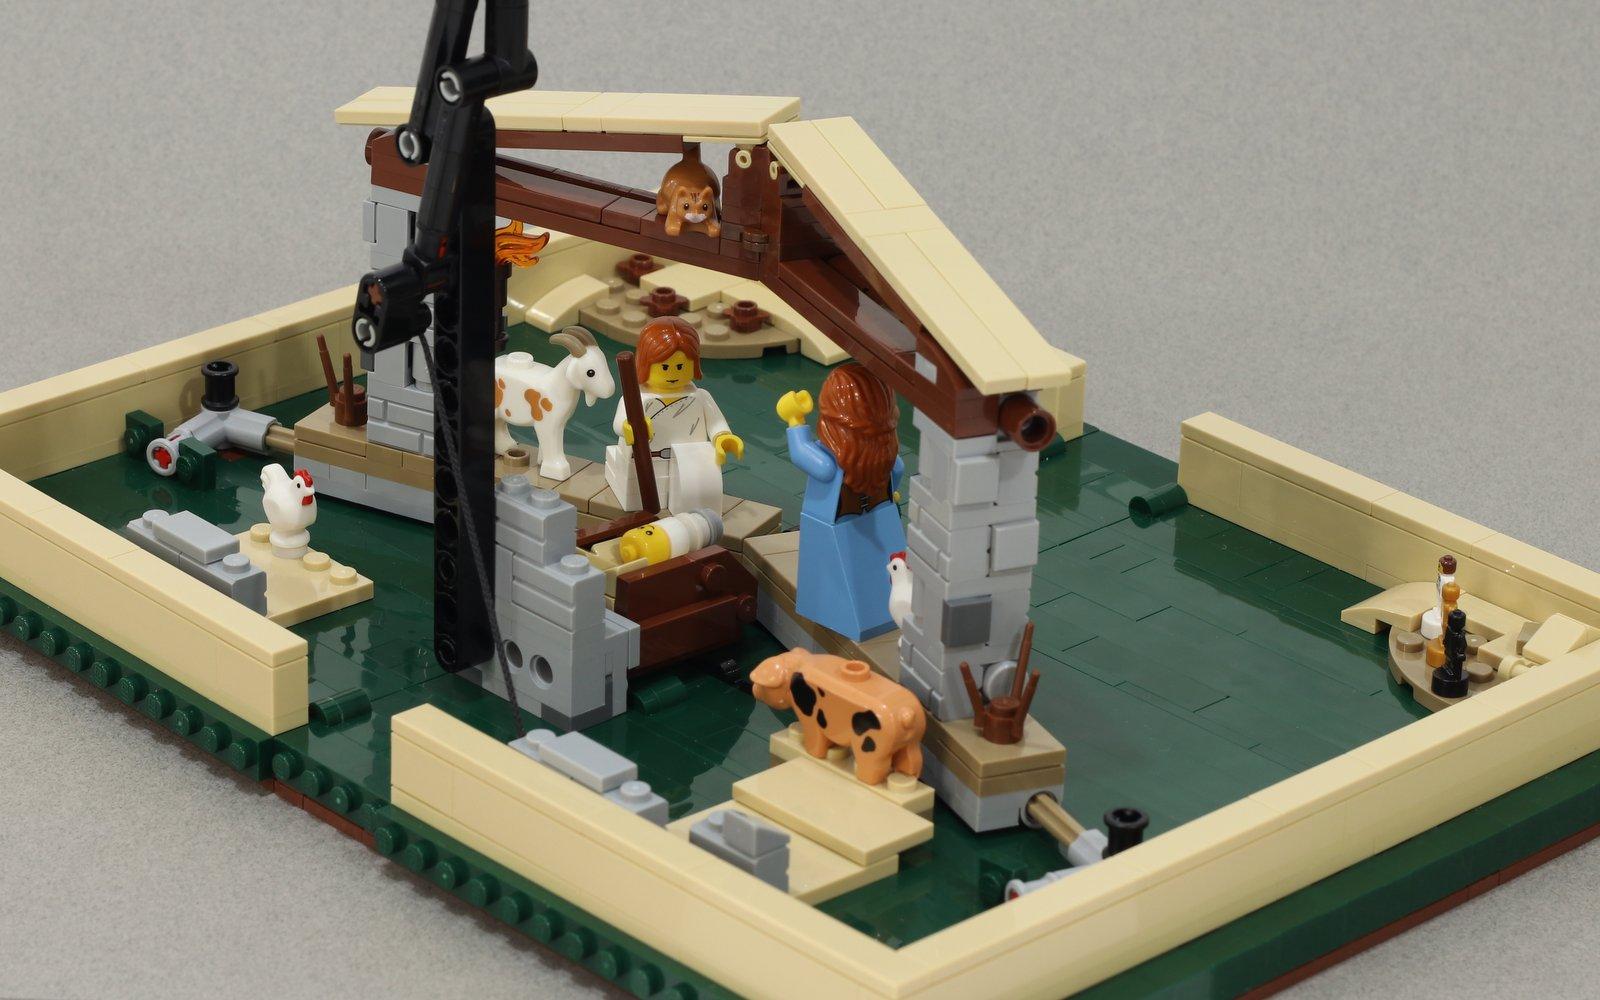 lego-idas-nativity-pop-up-book-jkbrickworks zusammengebaut.com